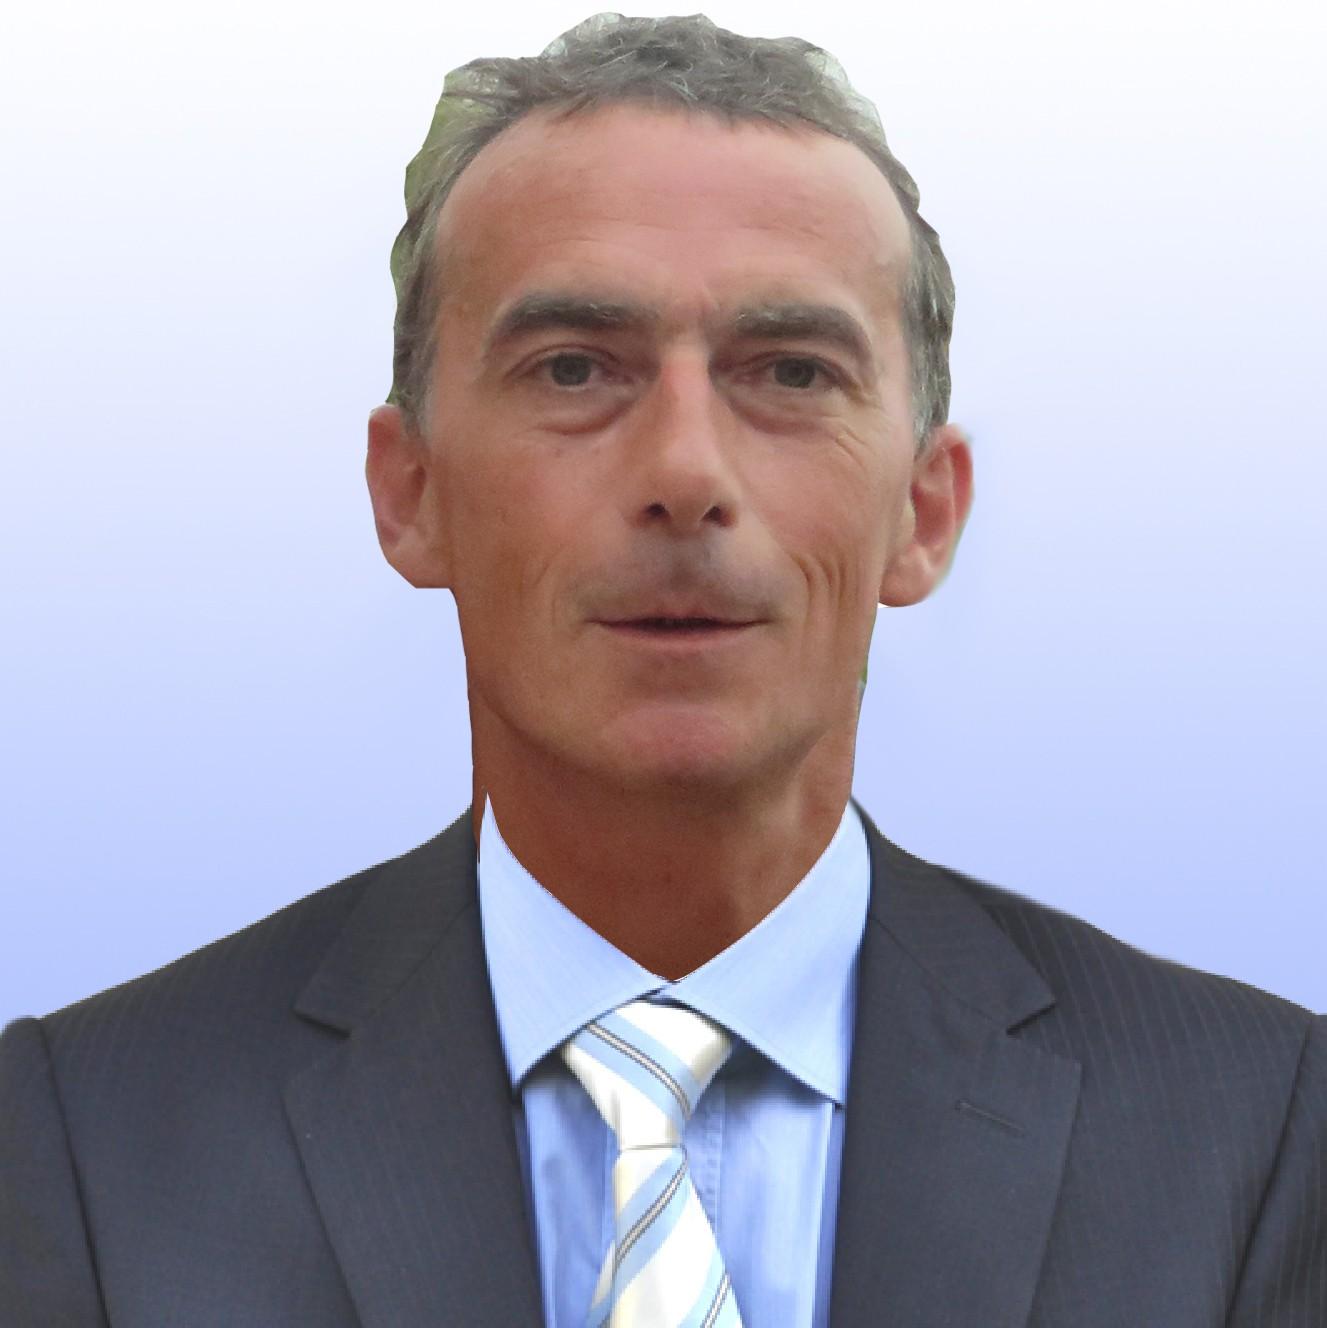 Frédéric LORIOT